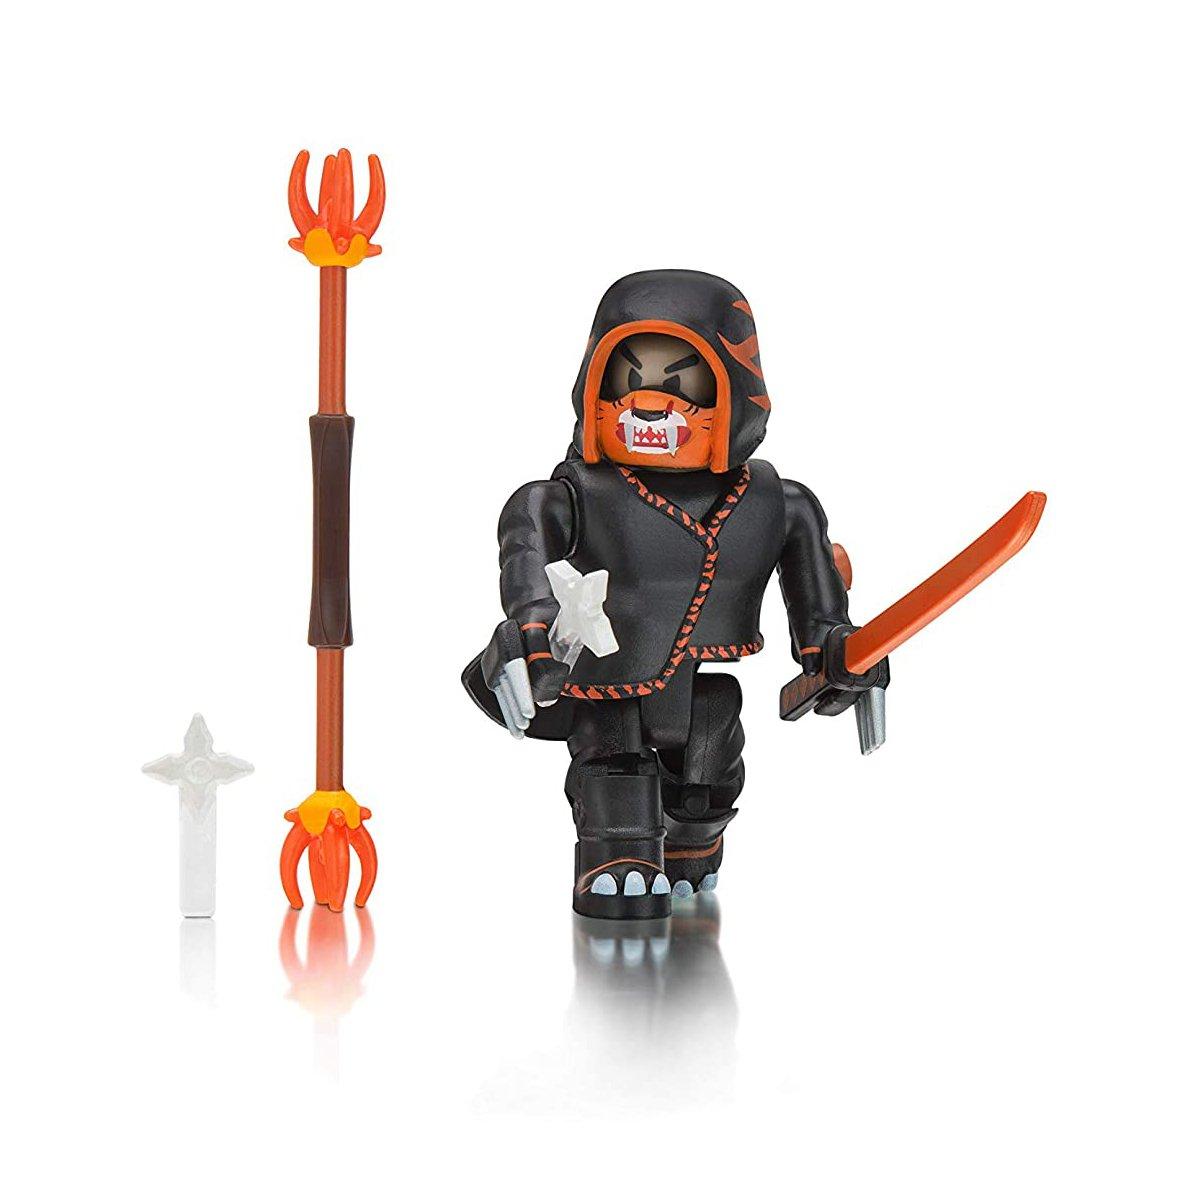 Figurina Roblox - The Phantom Claw imagine 2021